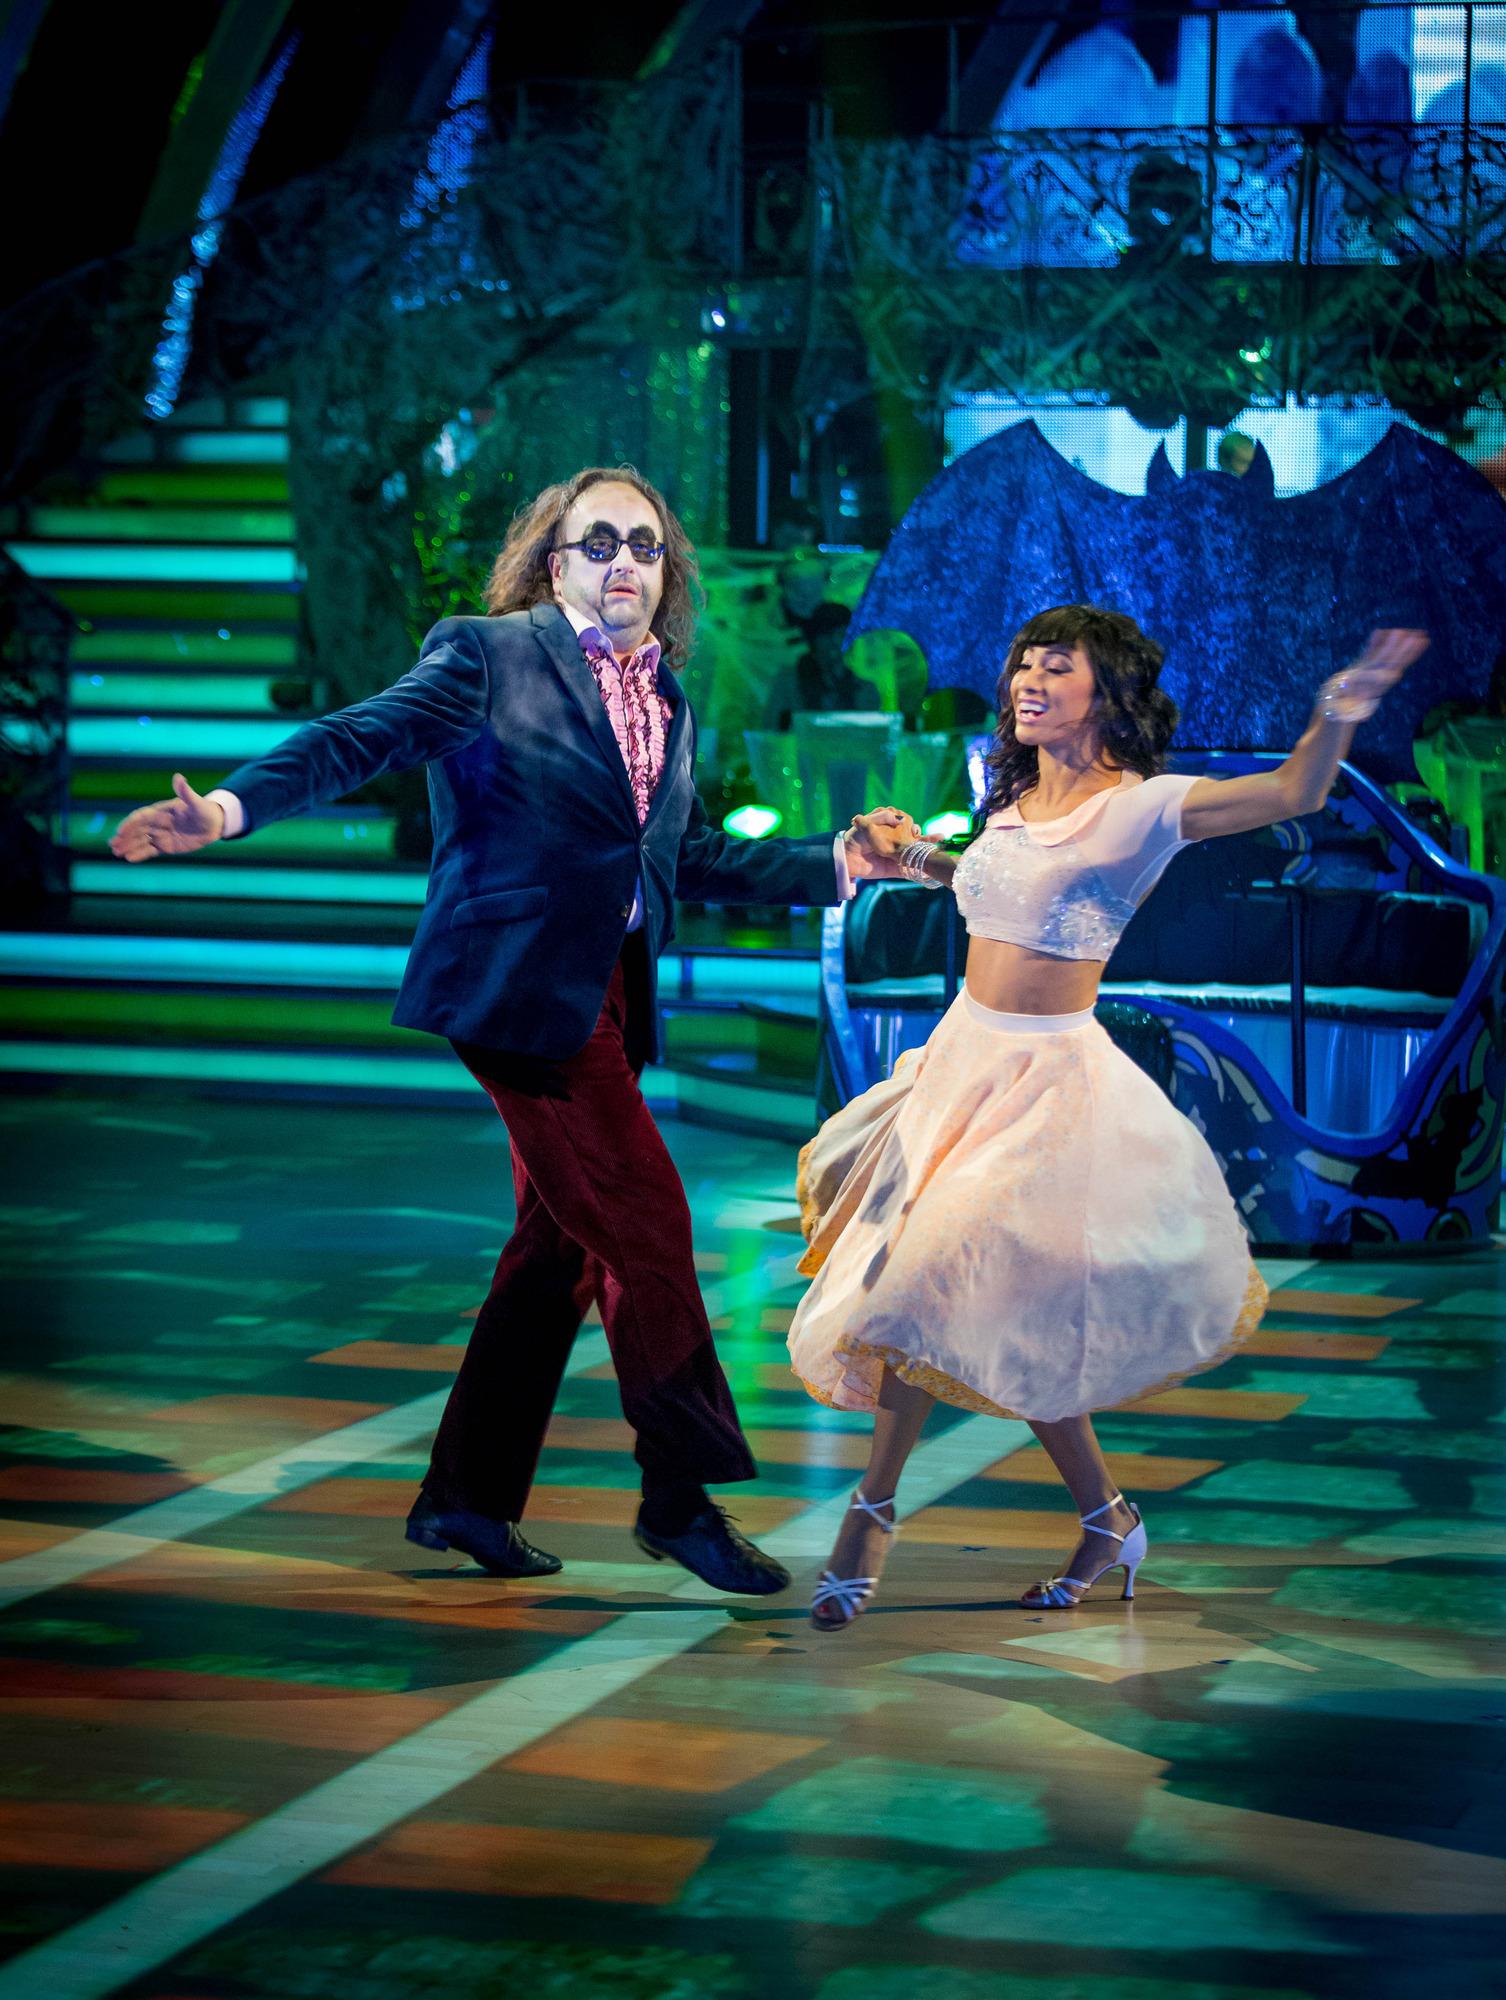 Dave Myers, Karen Hauer - (C) BBC - Photographer: Guy Levy